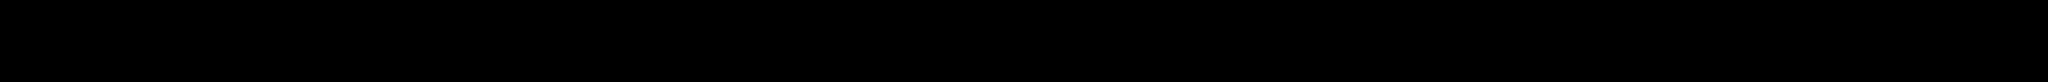 ZIMMERMANN 1K0 615 301 AA, 5Q0 615 301 F, L1KD 615 301 D, 1K0 615 301 AA, 5Q0 615 301 F Tarcza hamulcowa